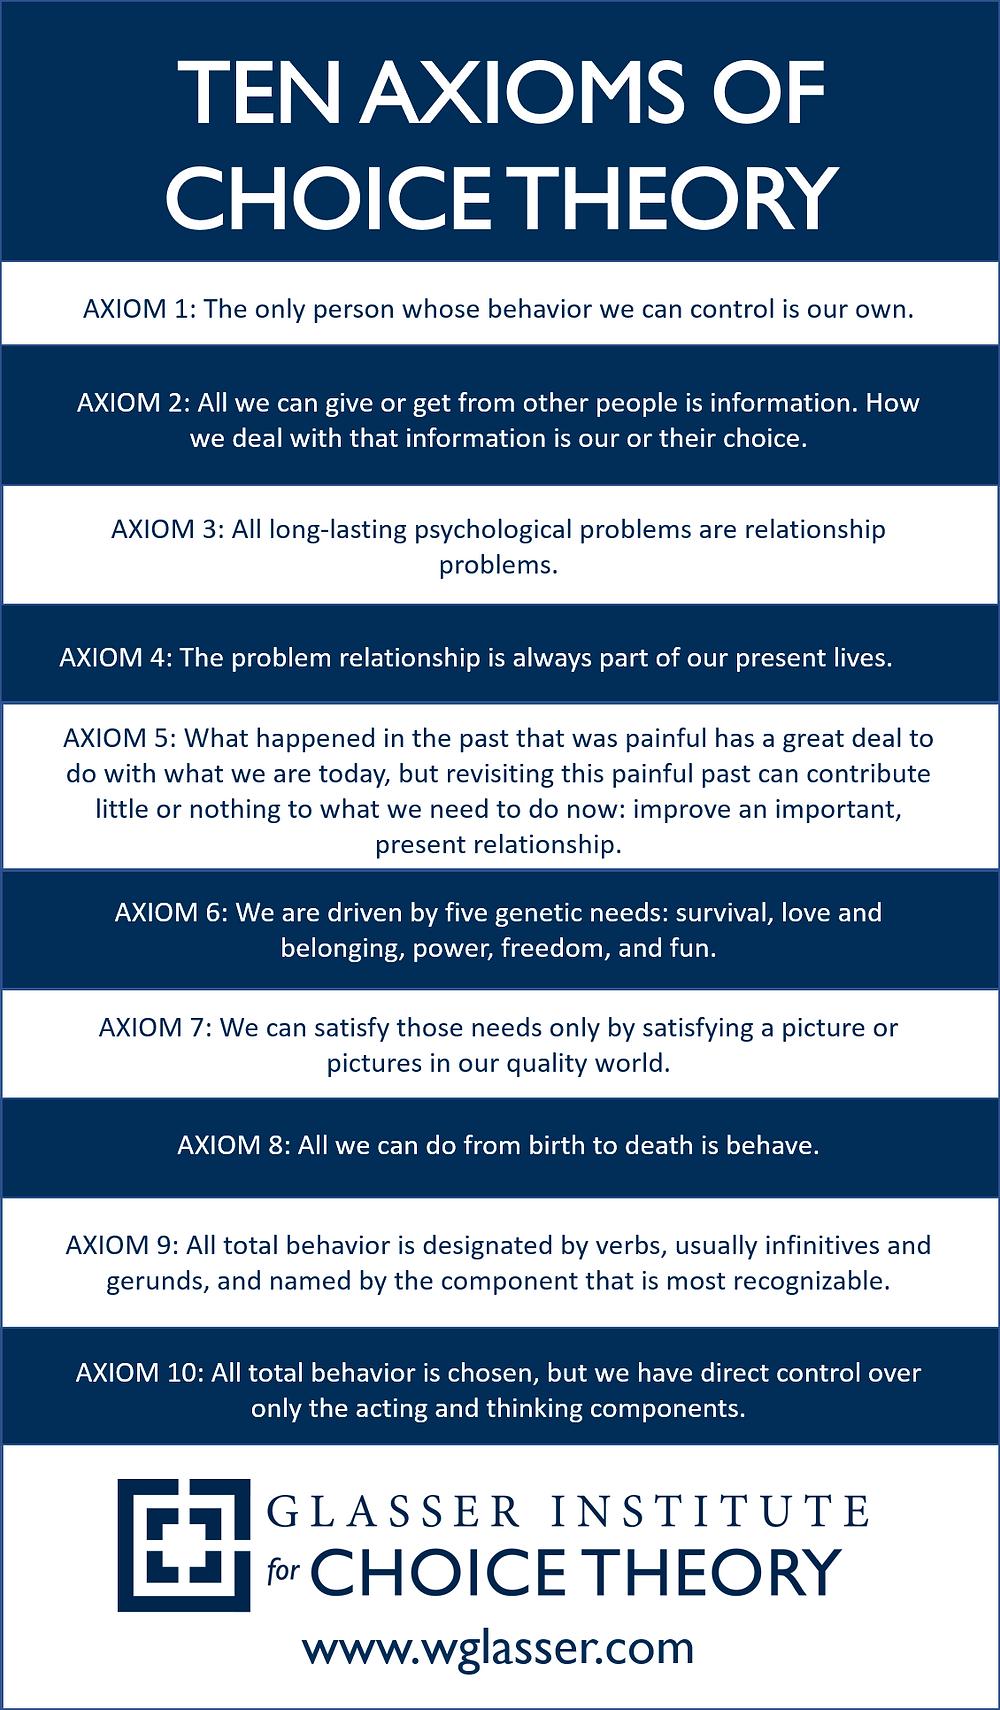 10 Axioms of Choice Theory